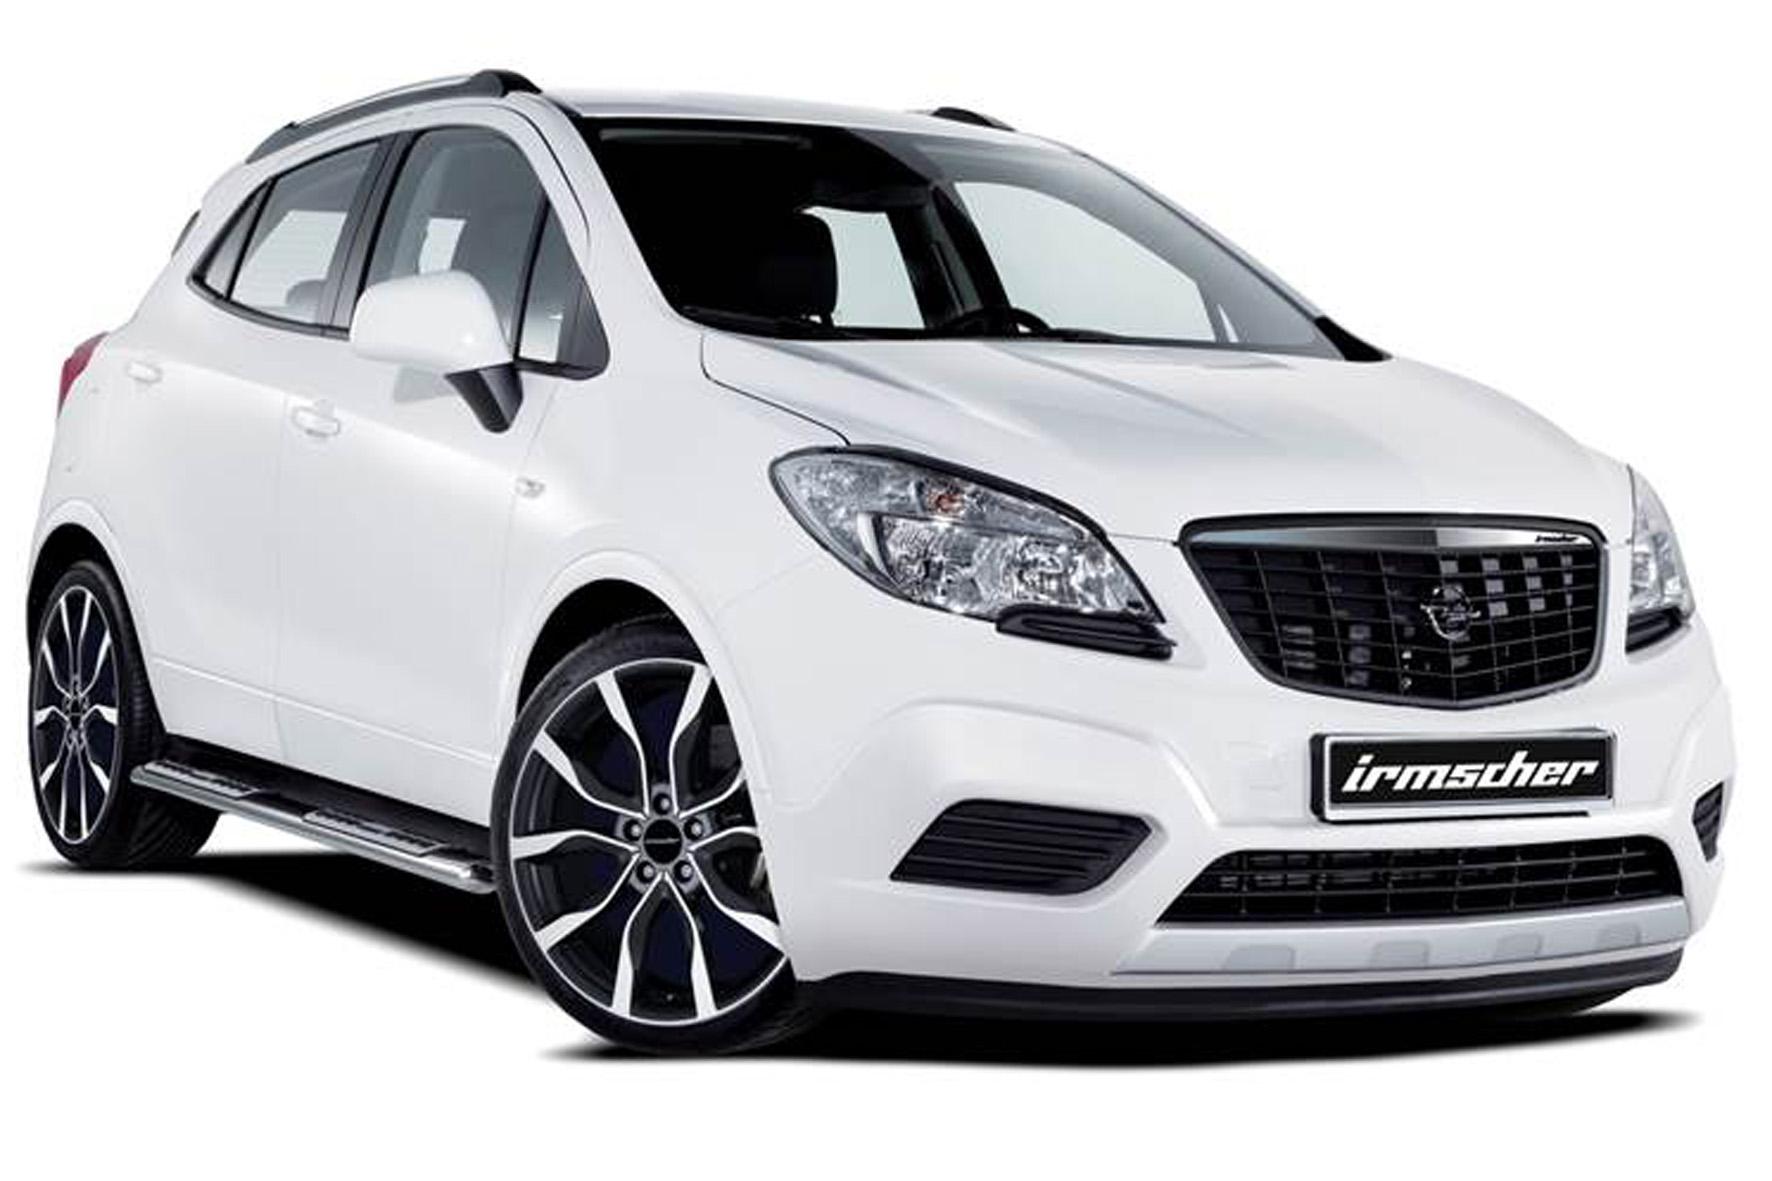 Opel Mokka mit Irmscher Felgen in Weiß